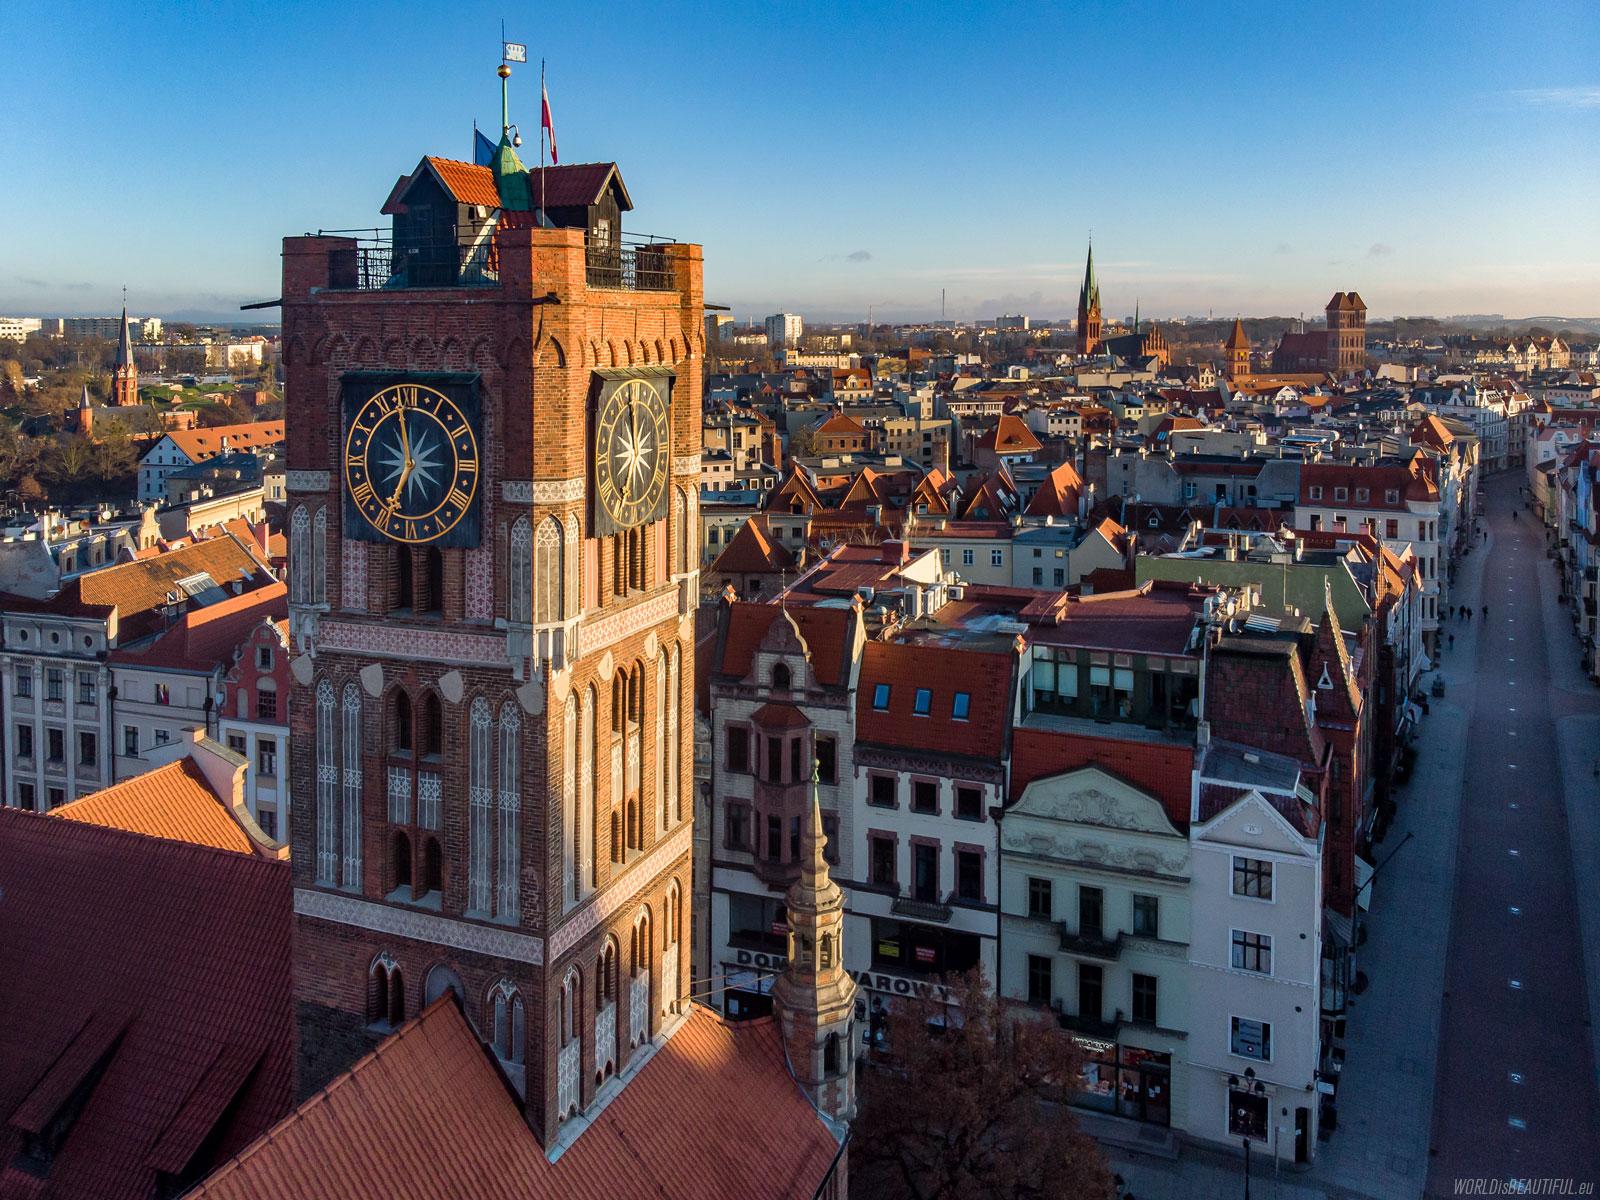 Toruń - the city center